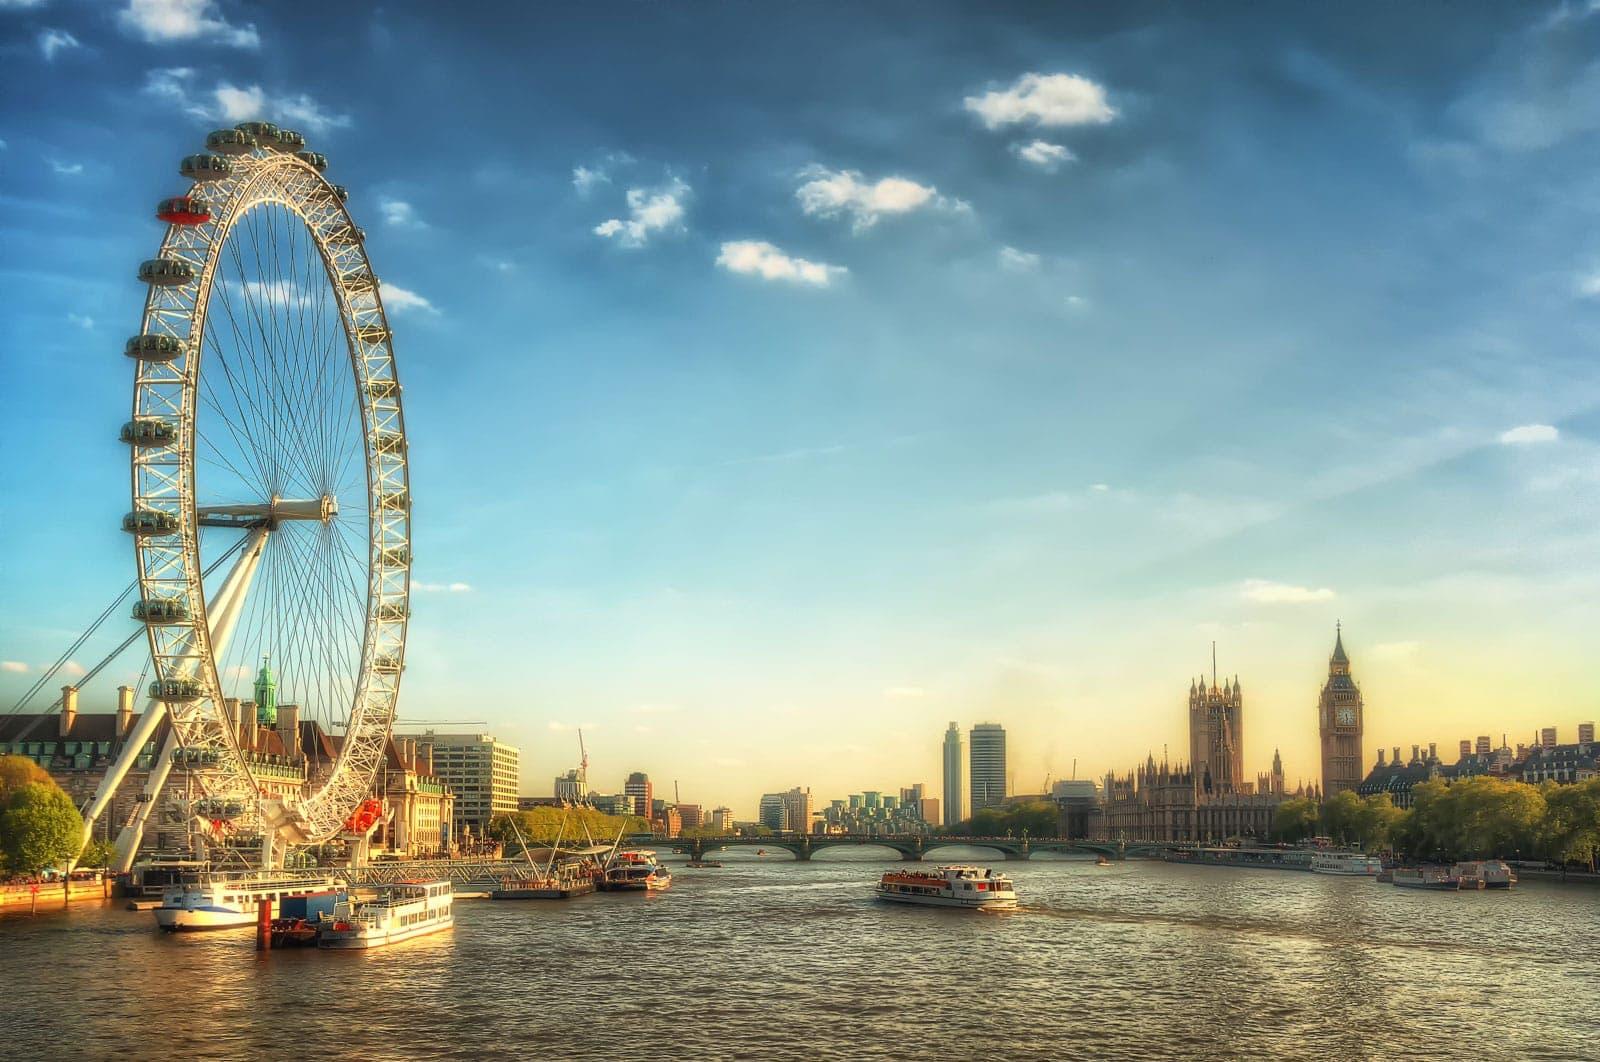 London Eye and Westminster | England